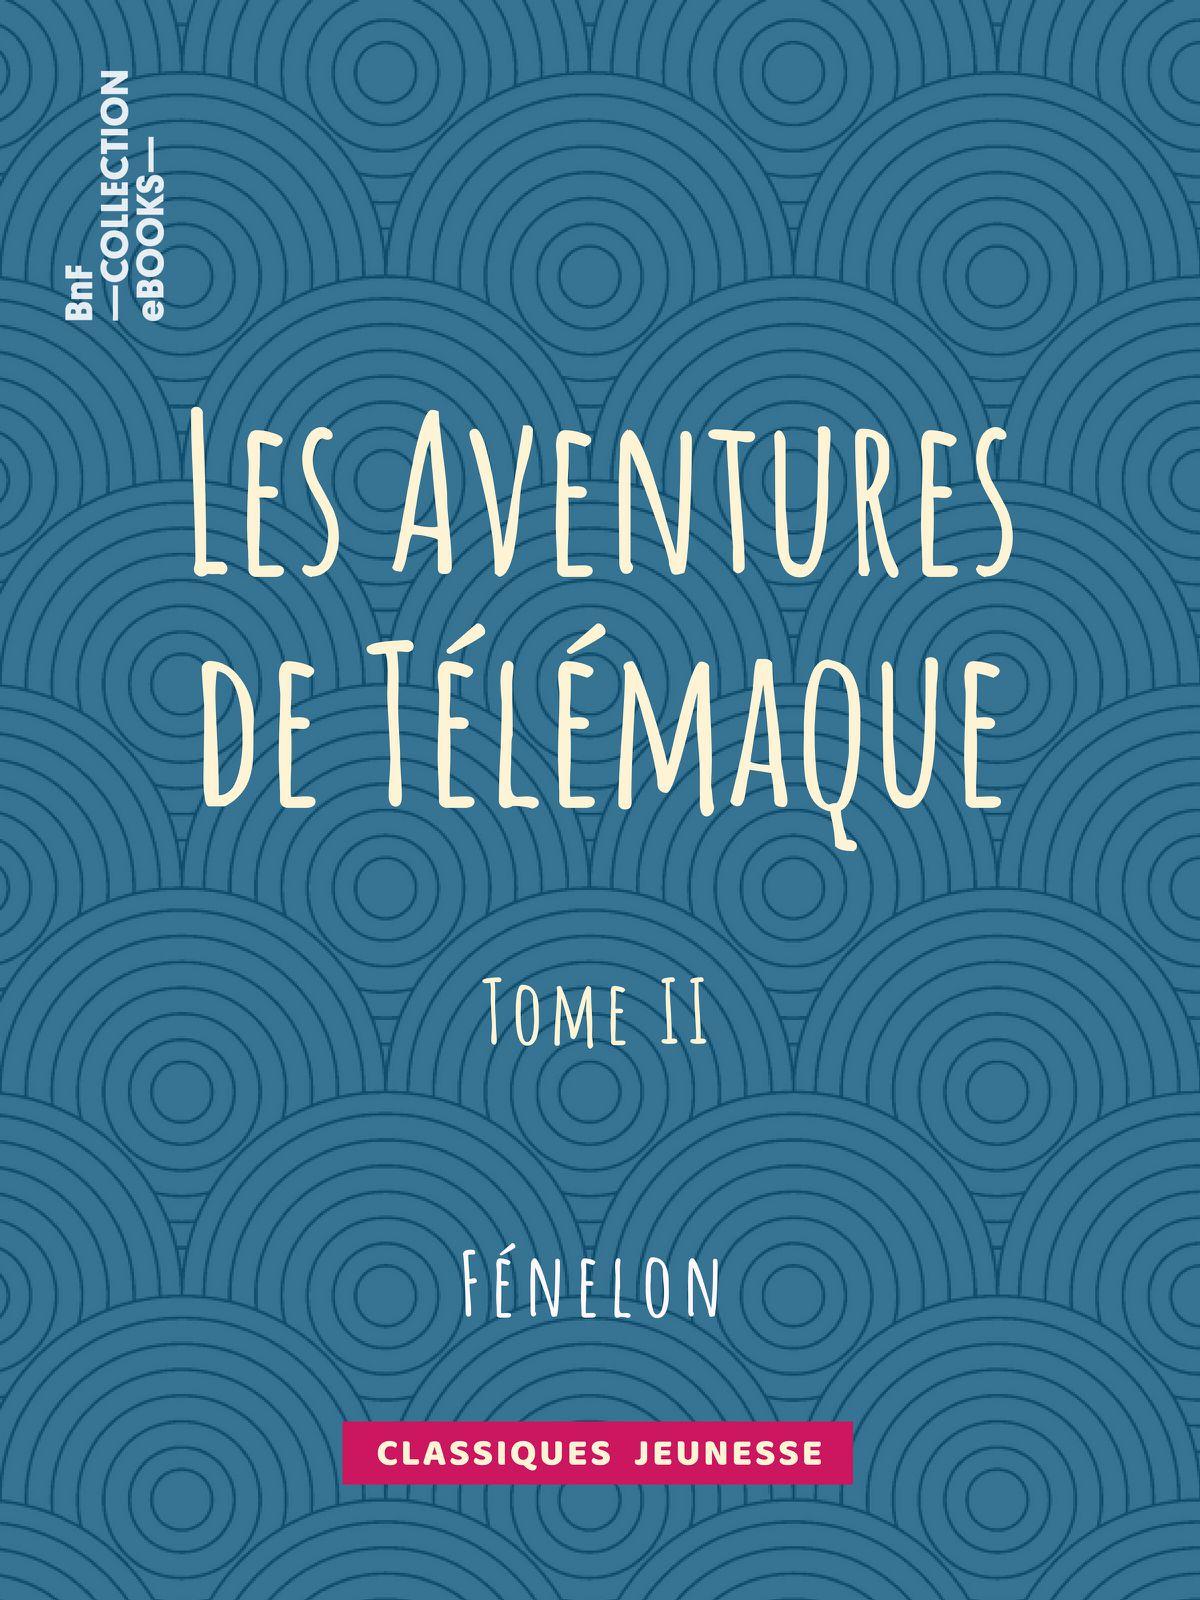 Les Aventures de Télémaque - Tome II |